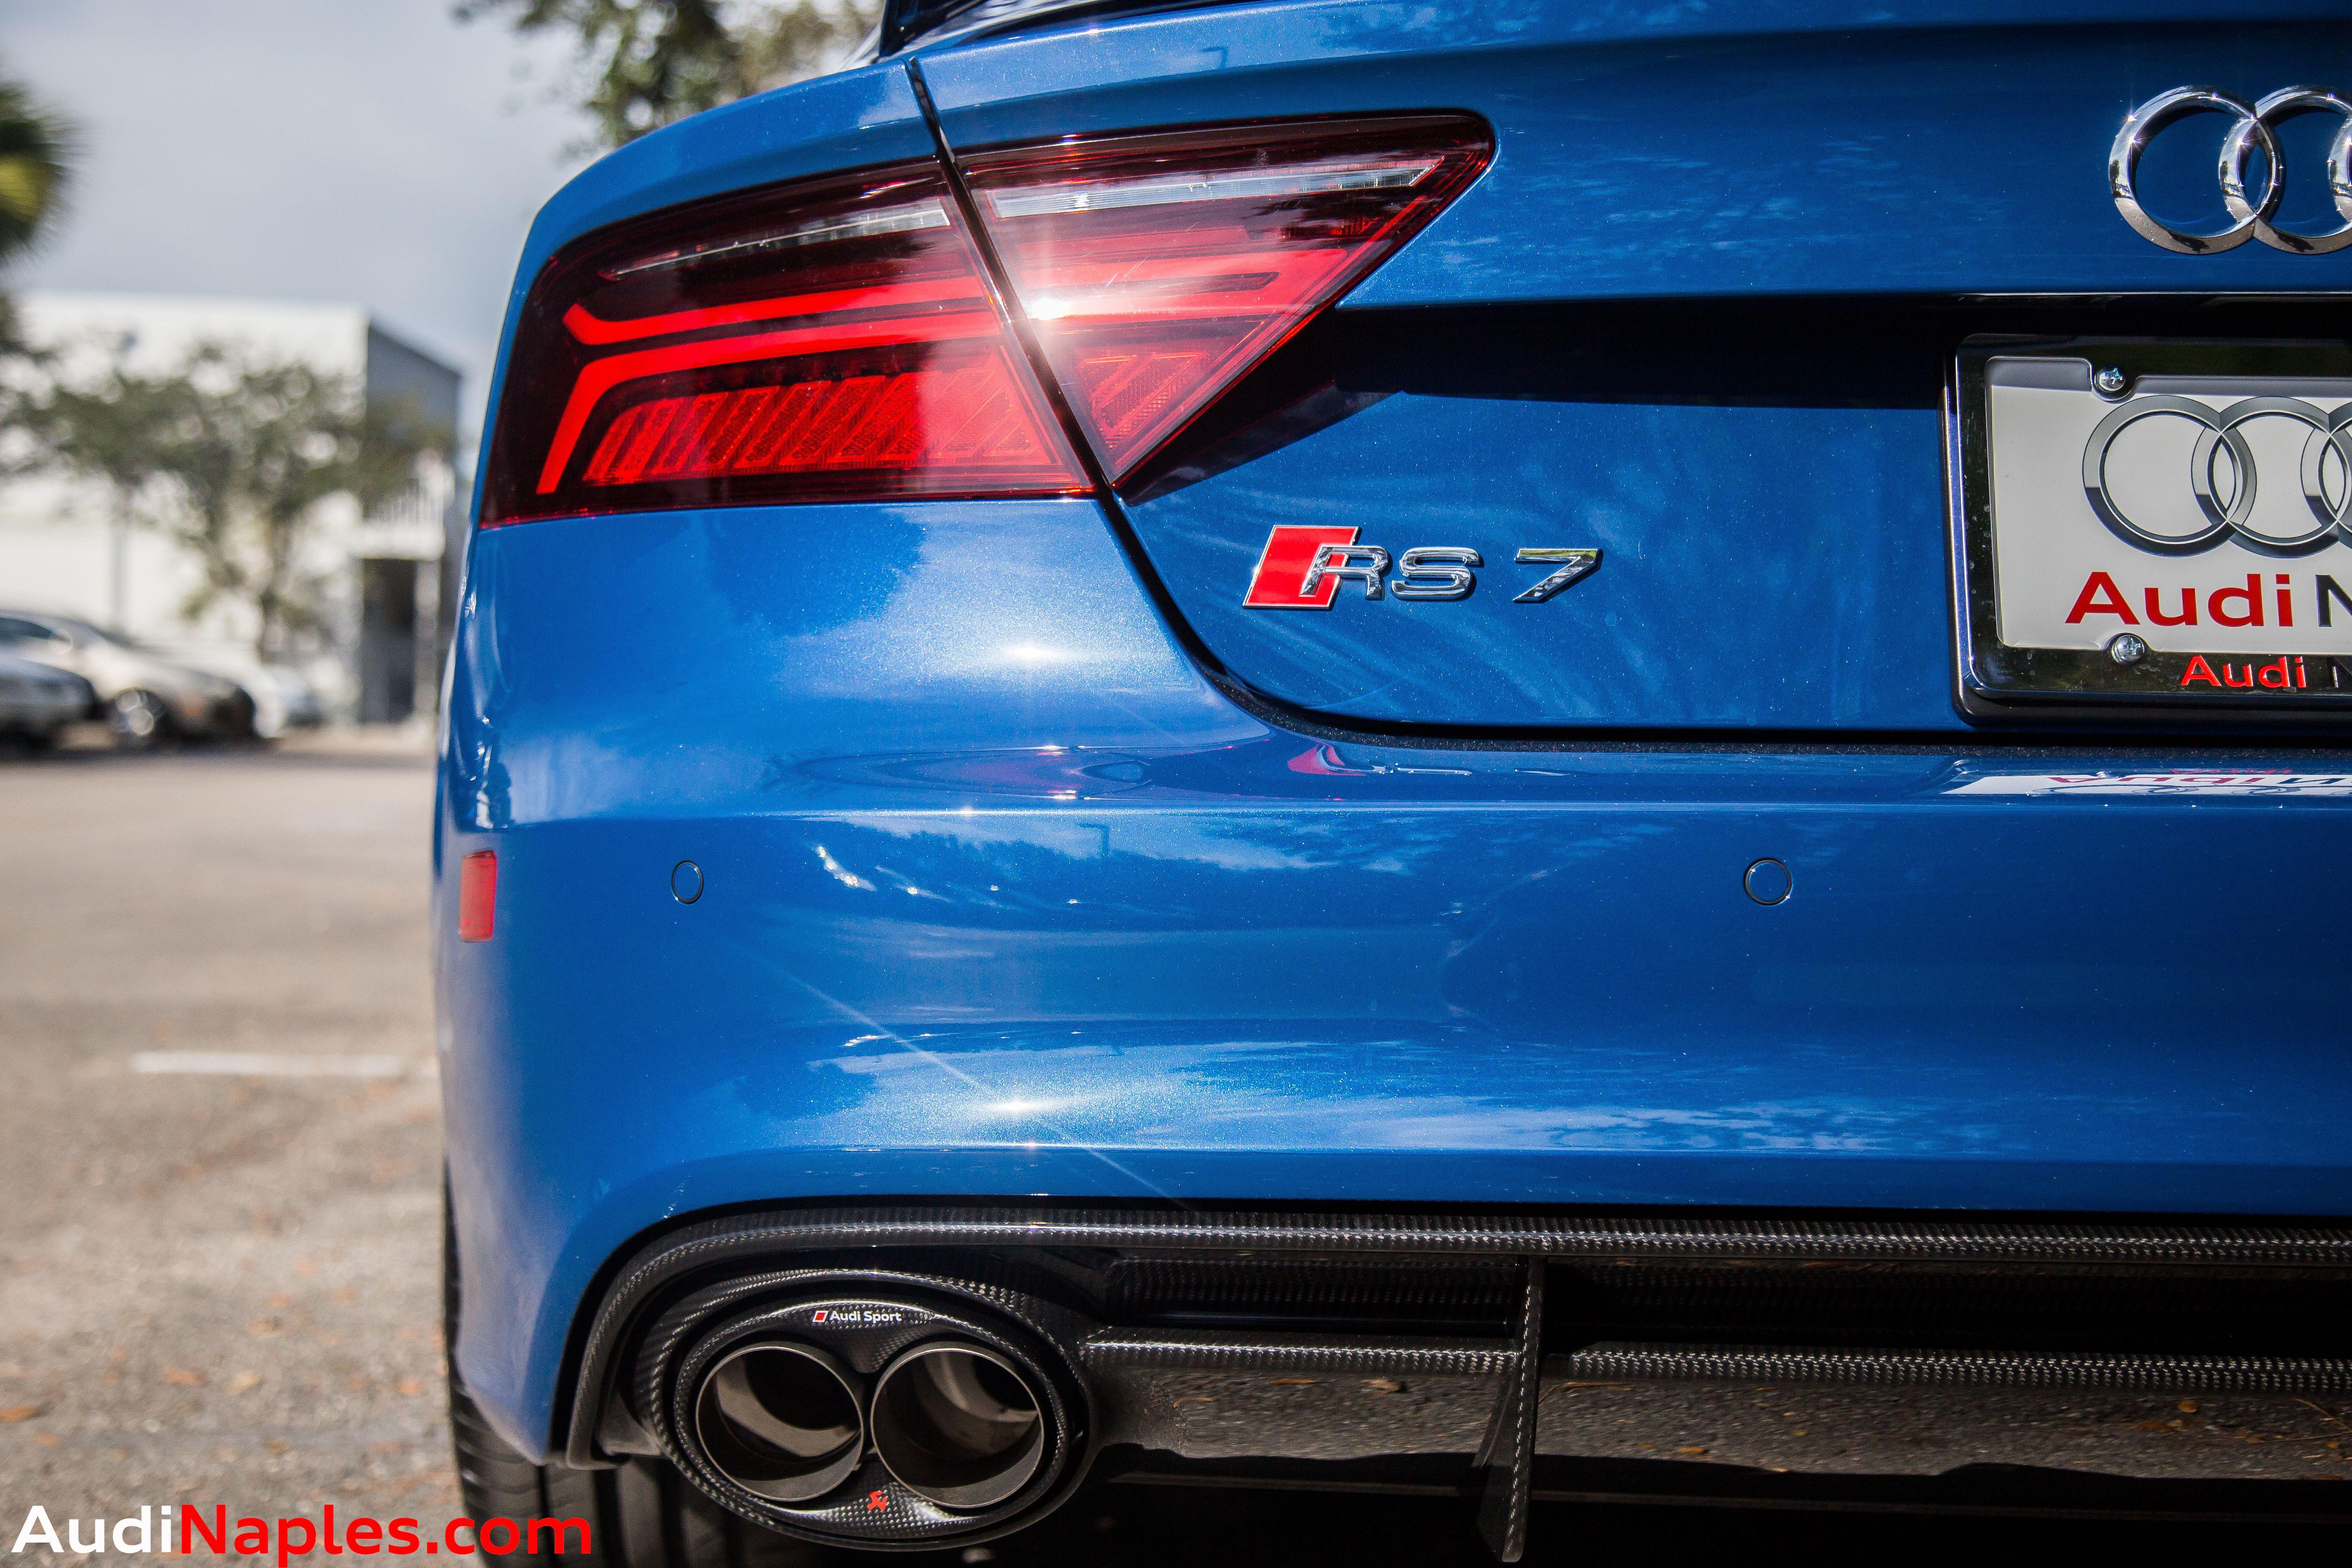 RS7 Ascari Blue Audi dealership, Audi, Used audi